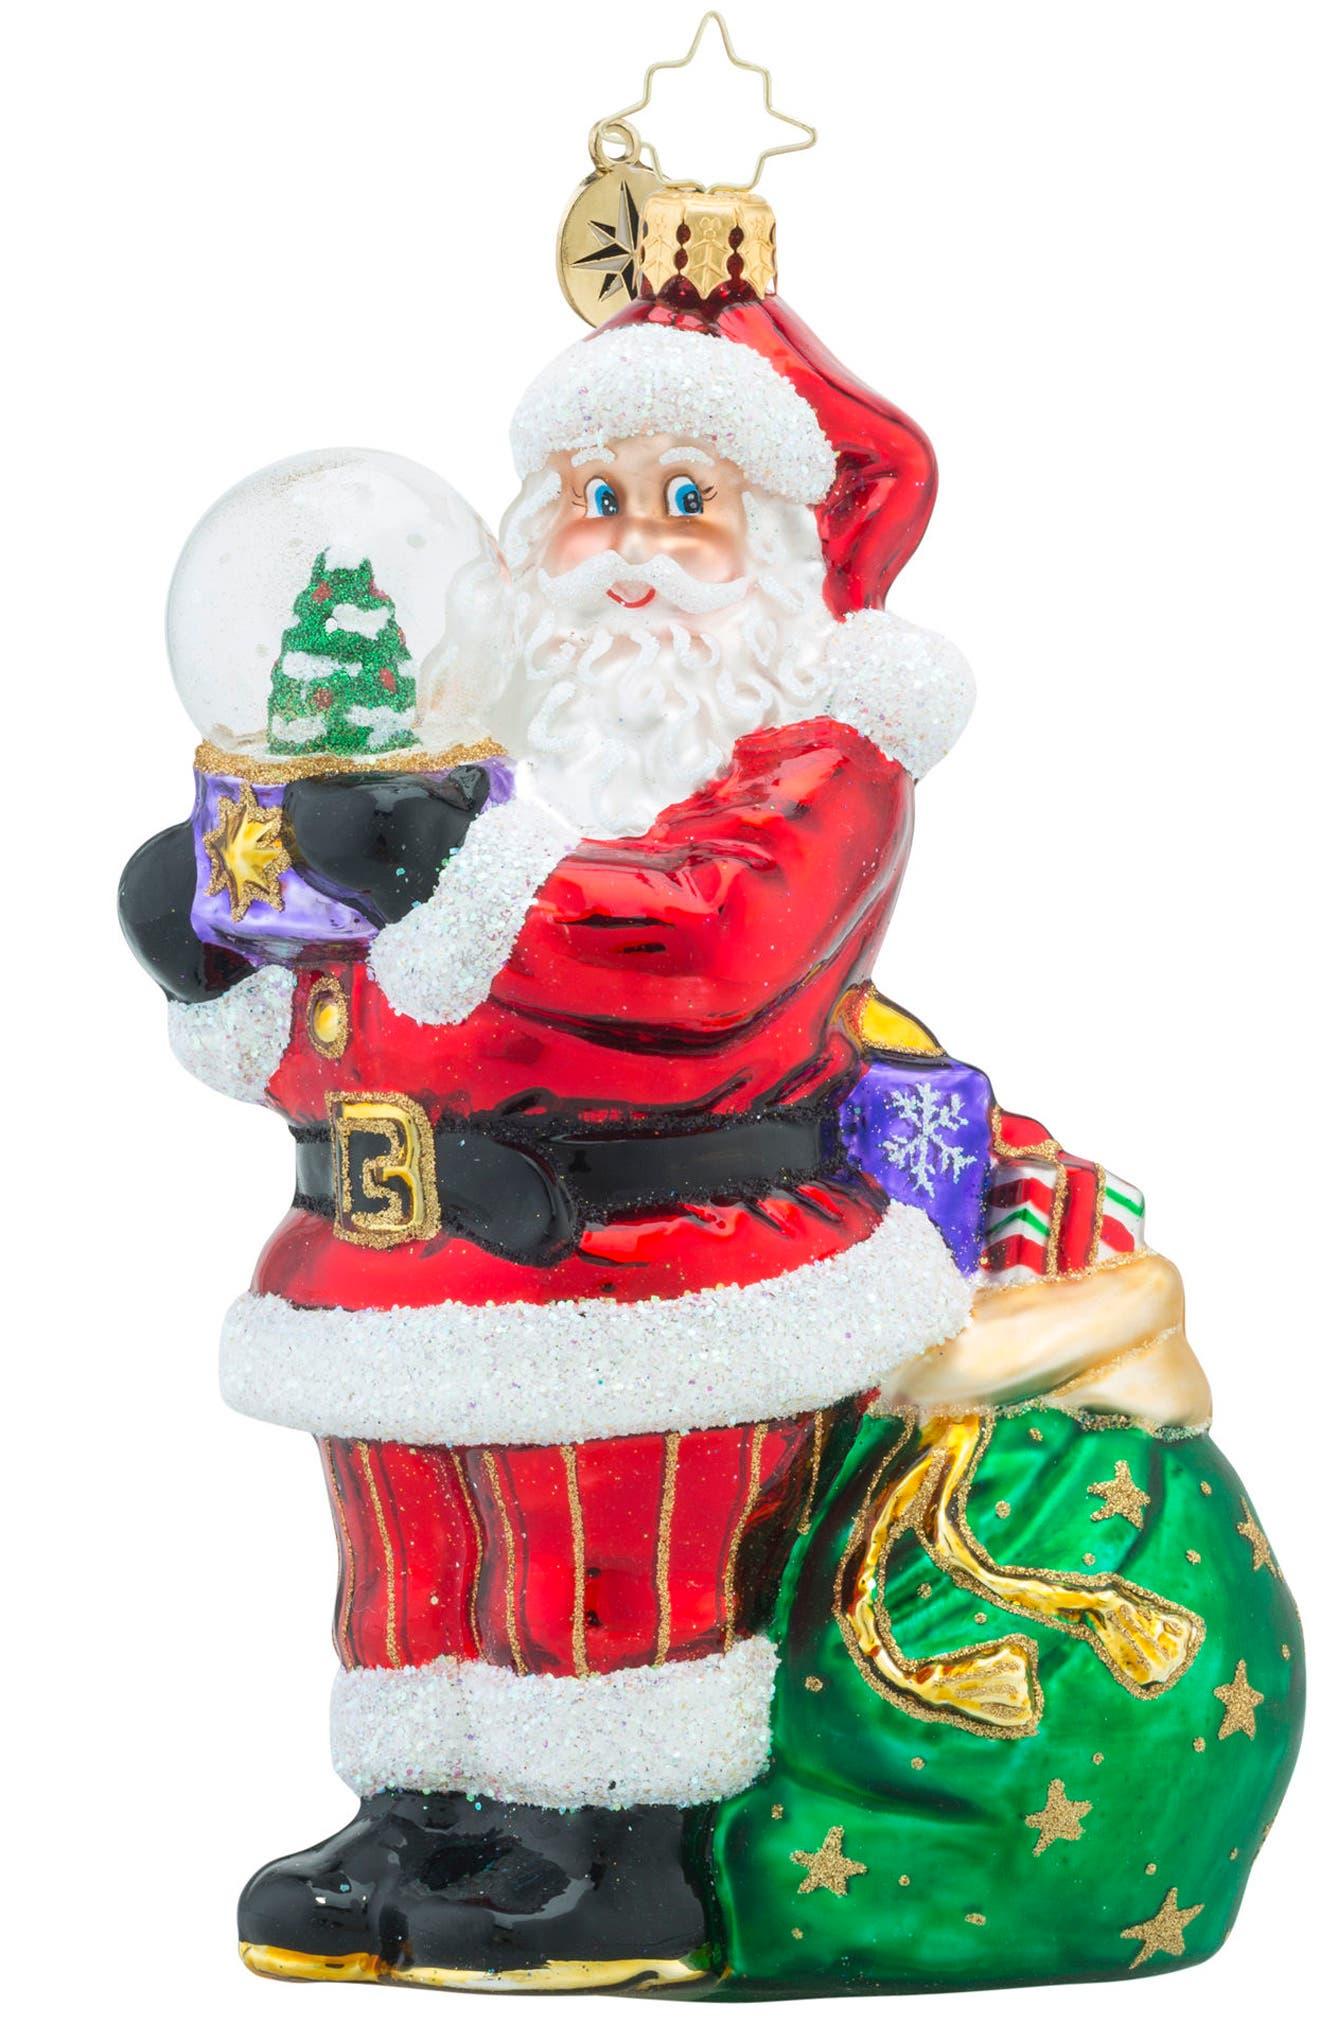 Main Image - Christopher Radko Winter Land Santa Claus Ornament